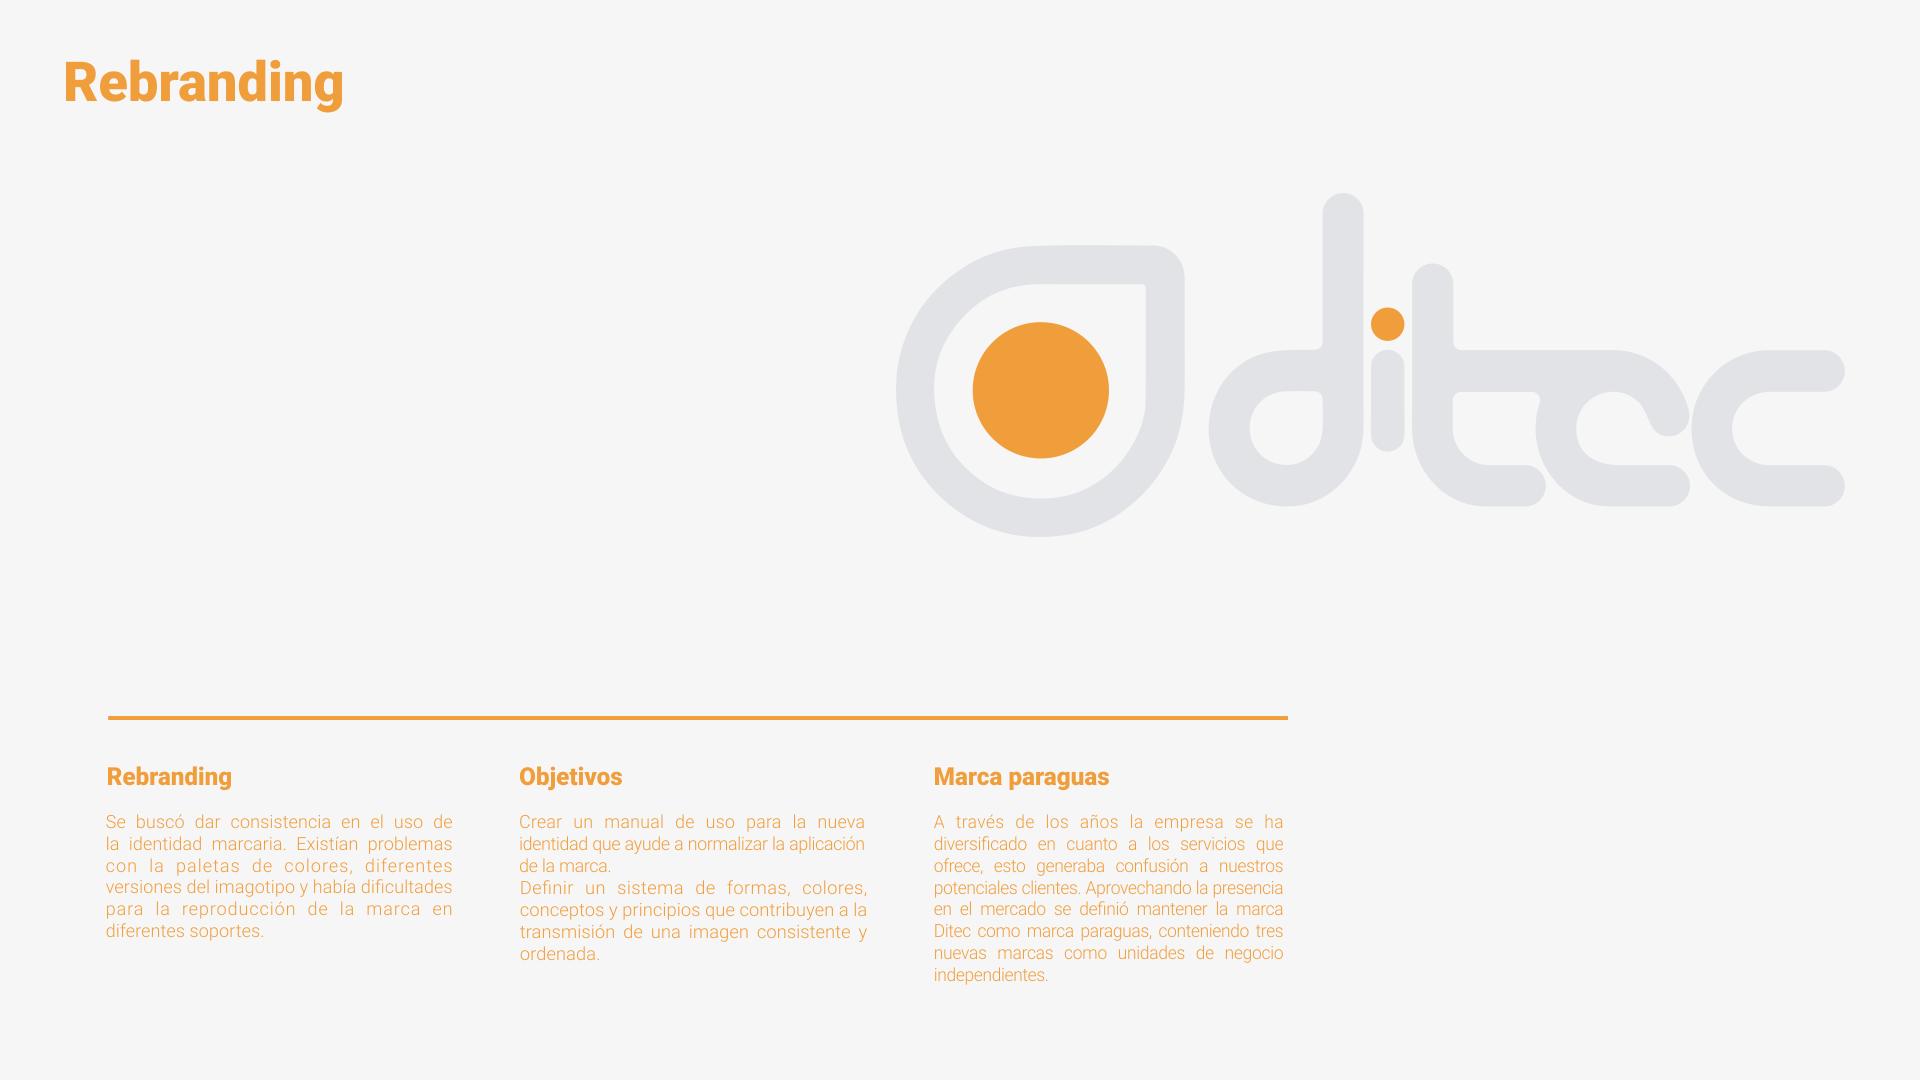 Proyecto de branding - Desallorro de marca para Ditec